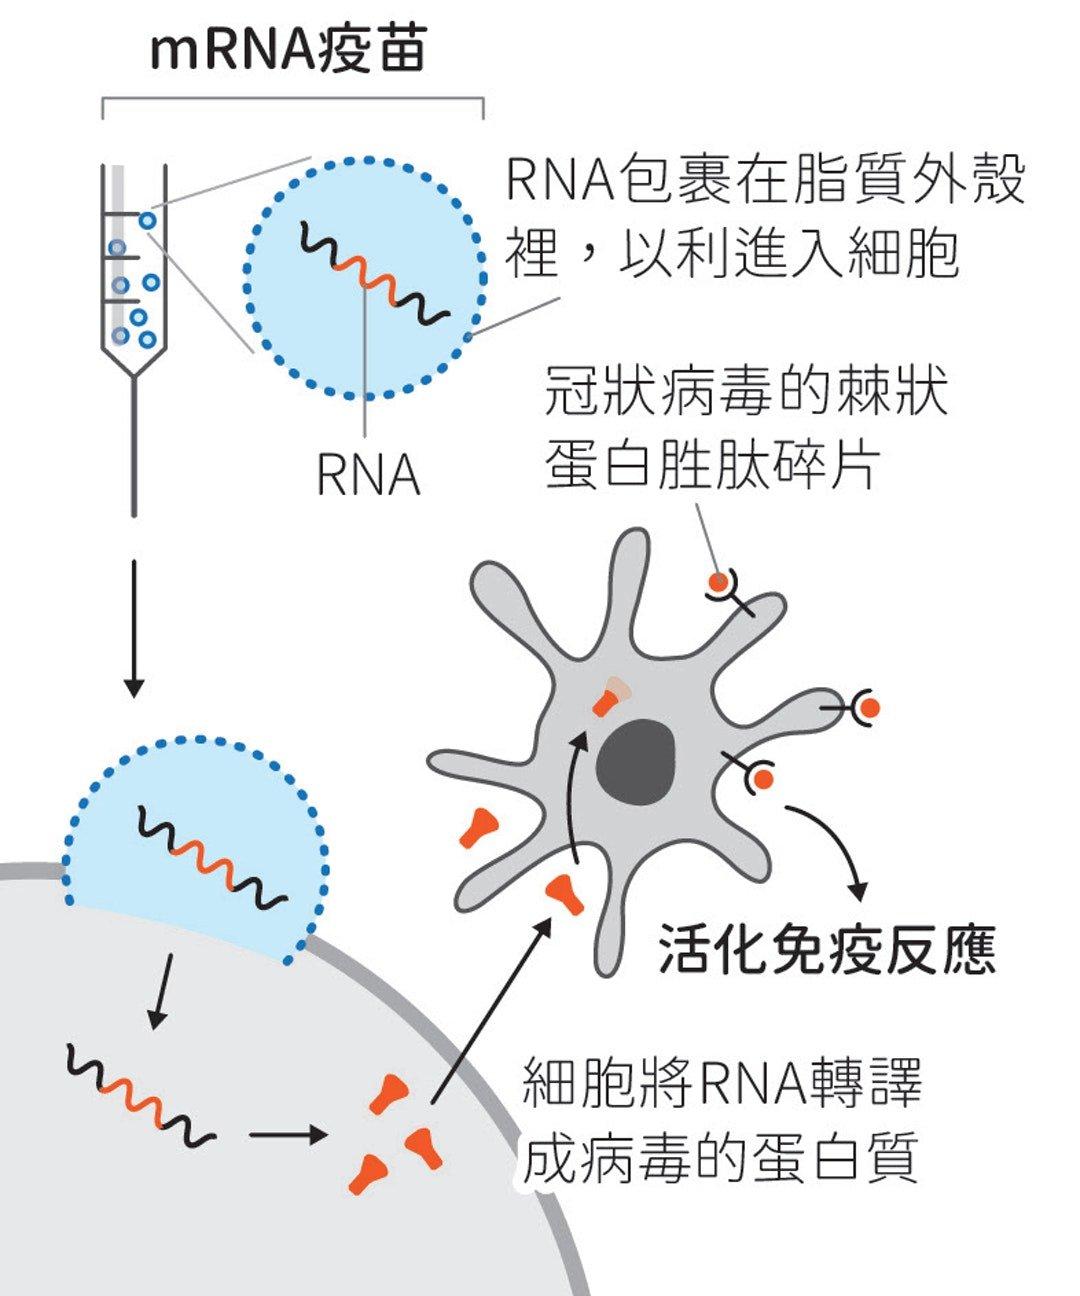 mRNA.jpg